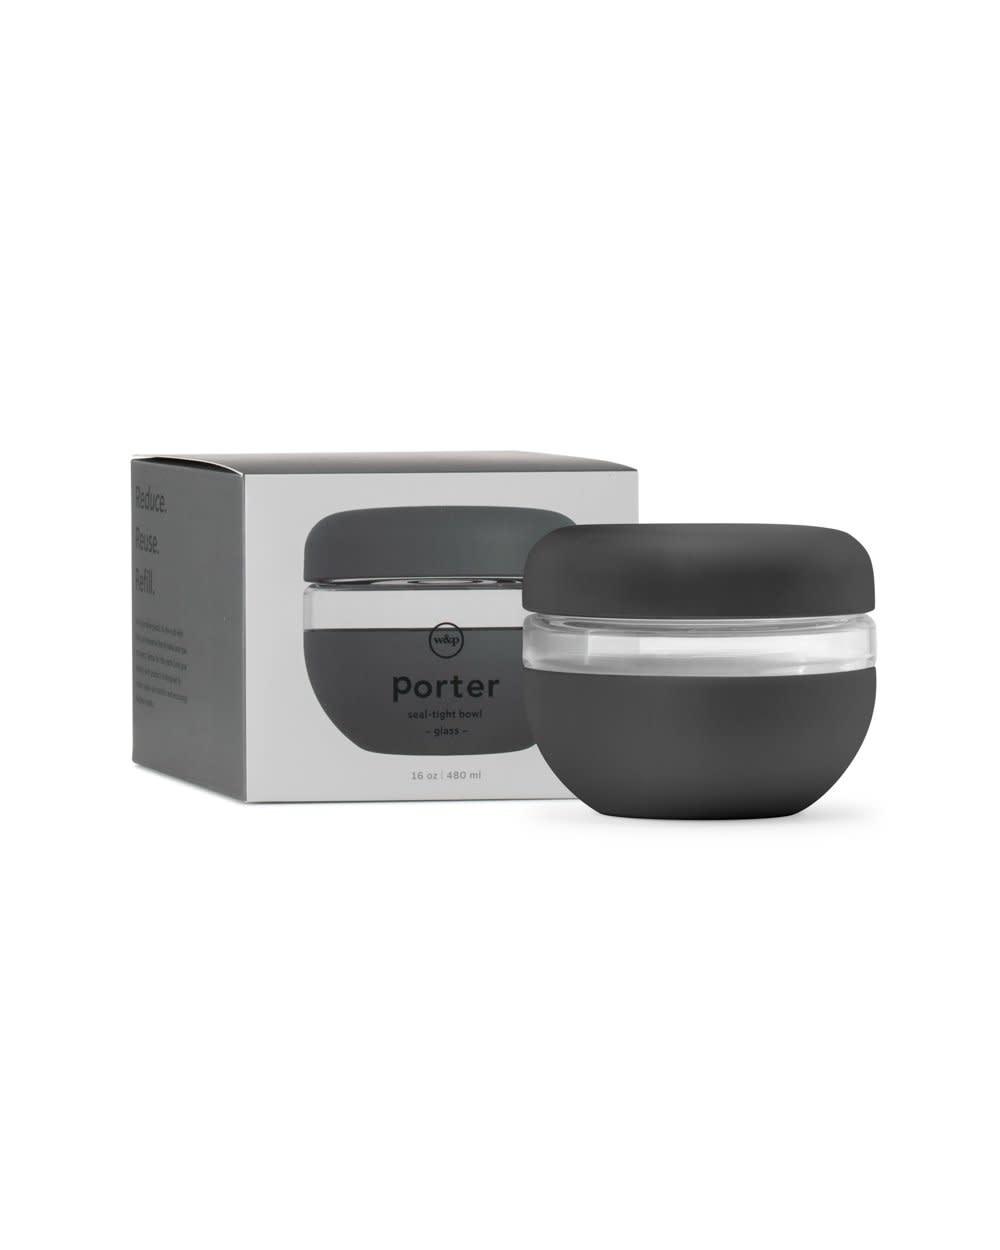 W&P Design The Porter Seal Tight Bowl - 16 oz